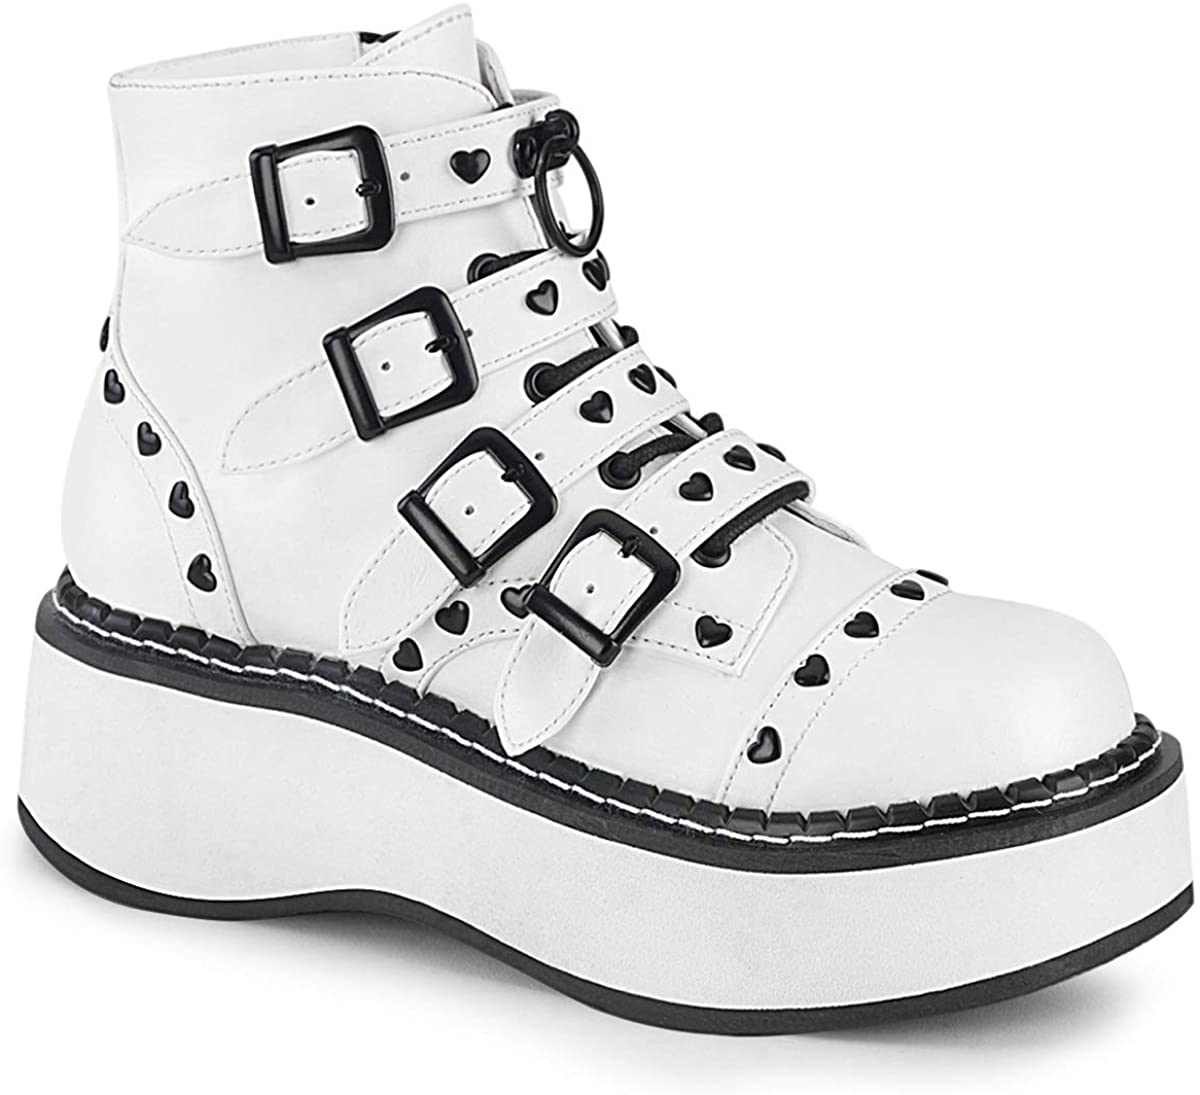 Demonia Women's Emily-315 Ankle-High Boot